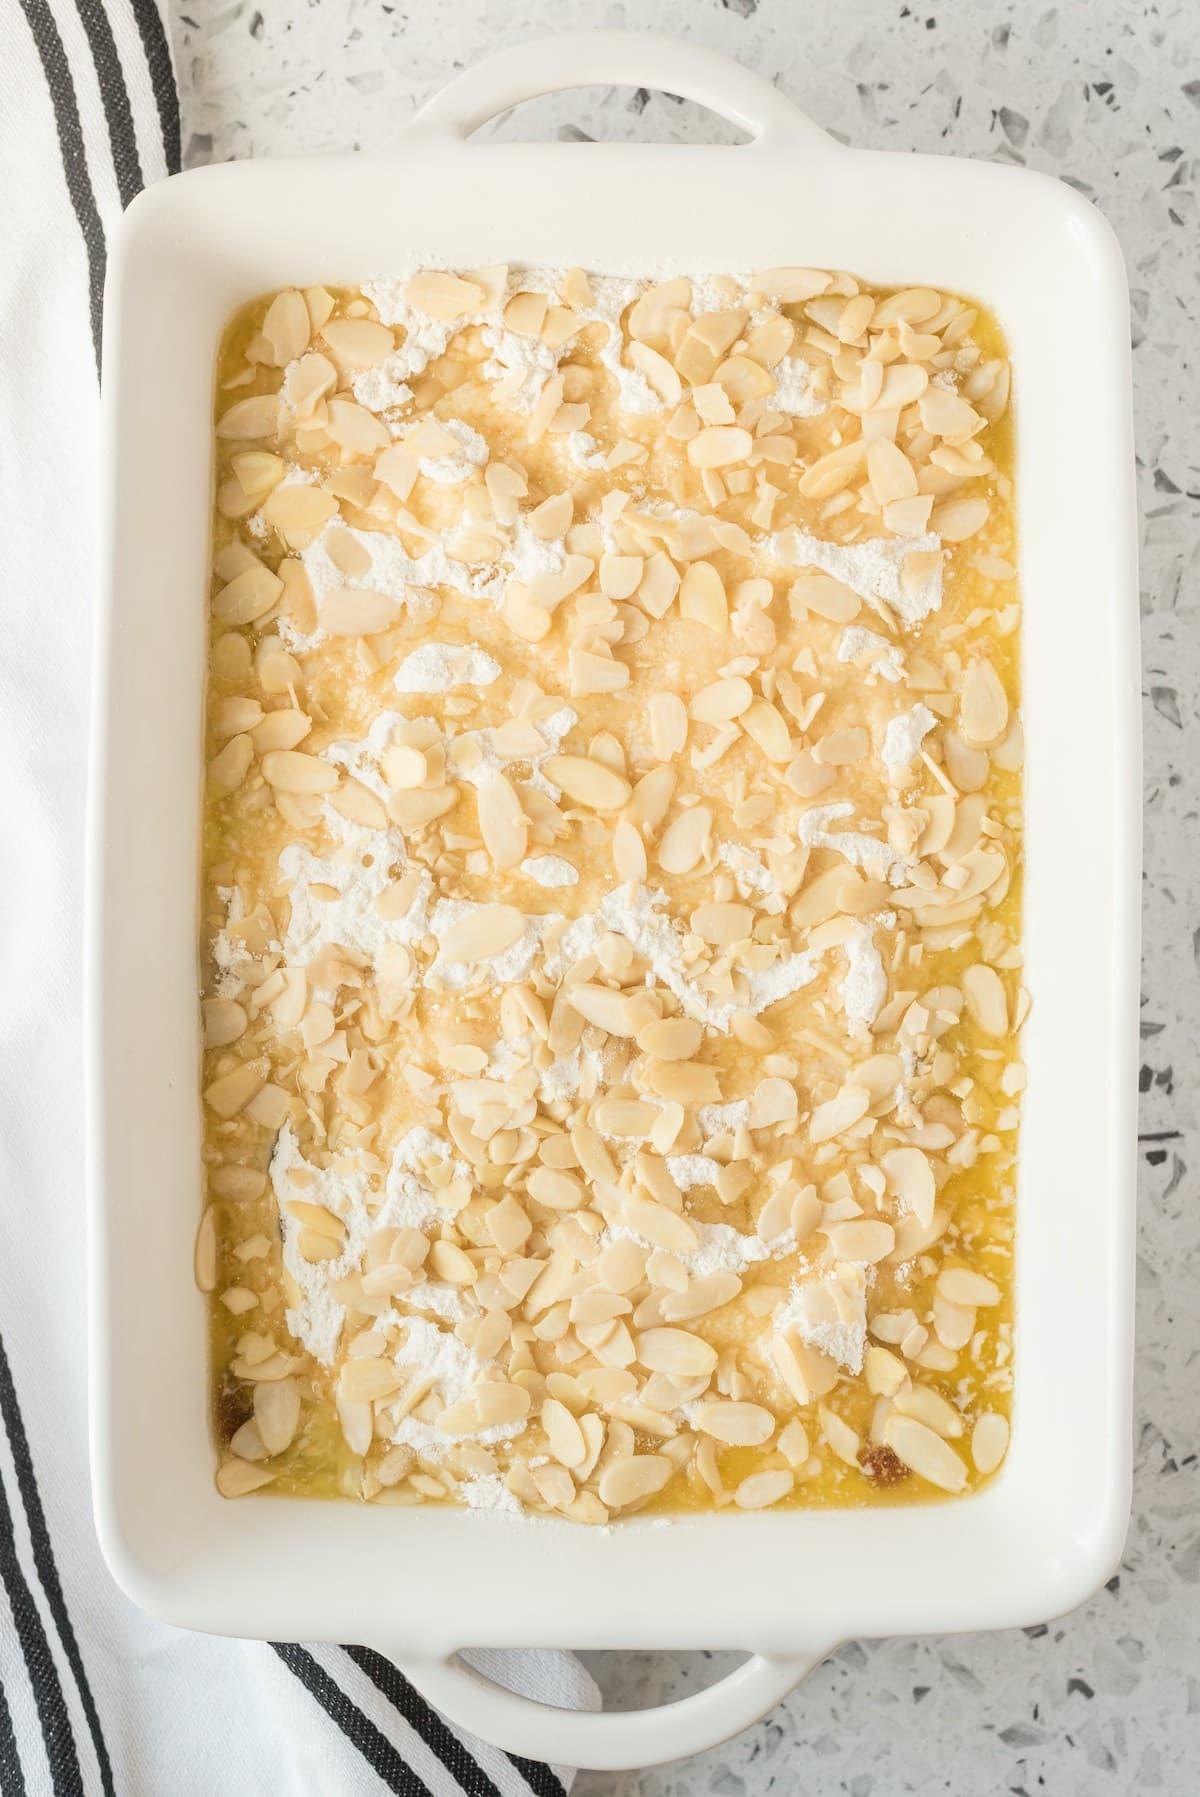 pour almond slices into the baking pan